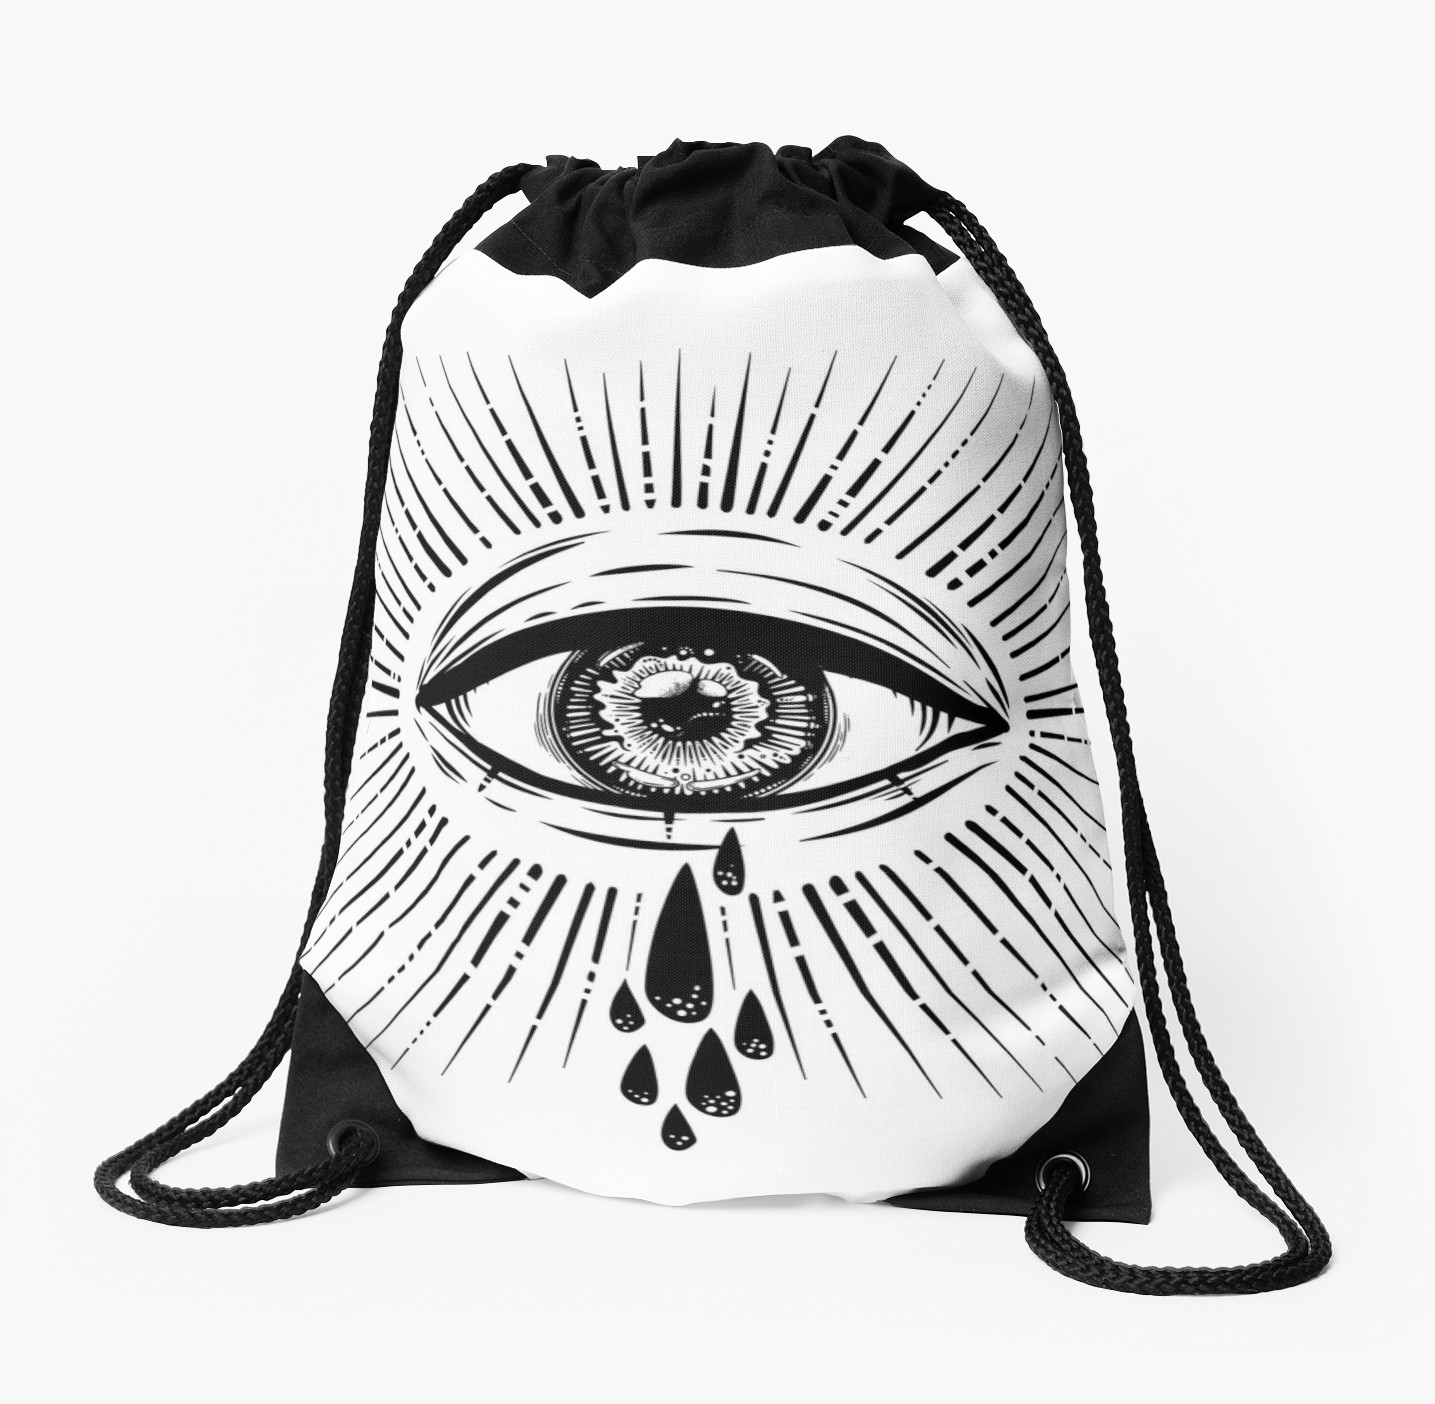 1435x1404 All Seeing Eye Crying Watery Tears Drawstring Bag